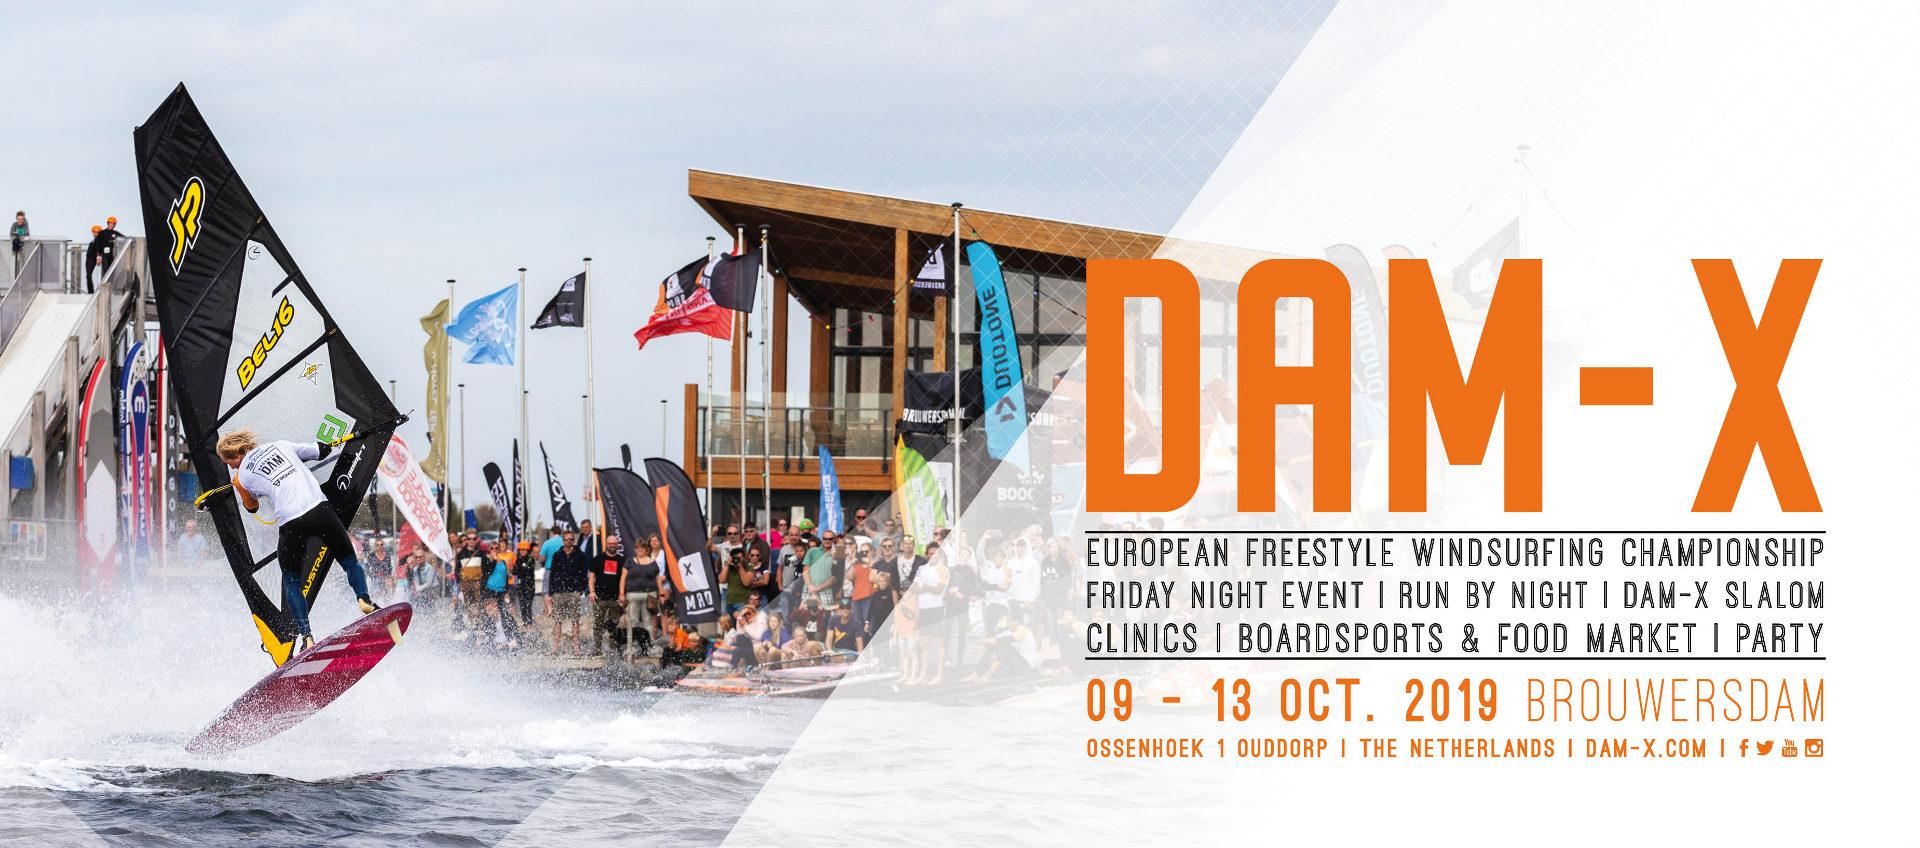 Dam X Event 10 T/M 14 oktober